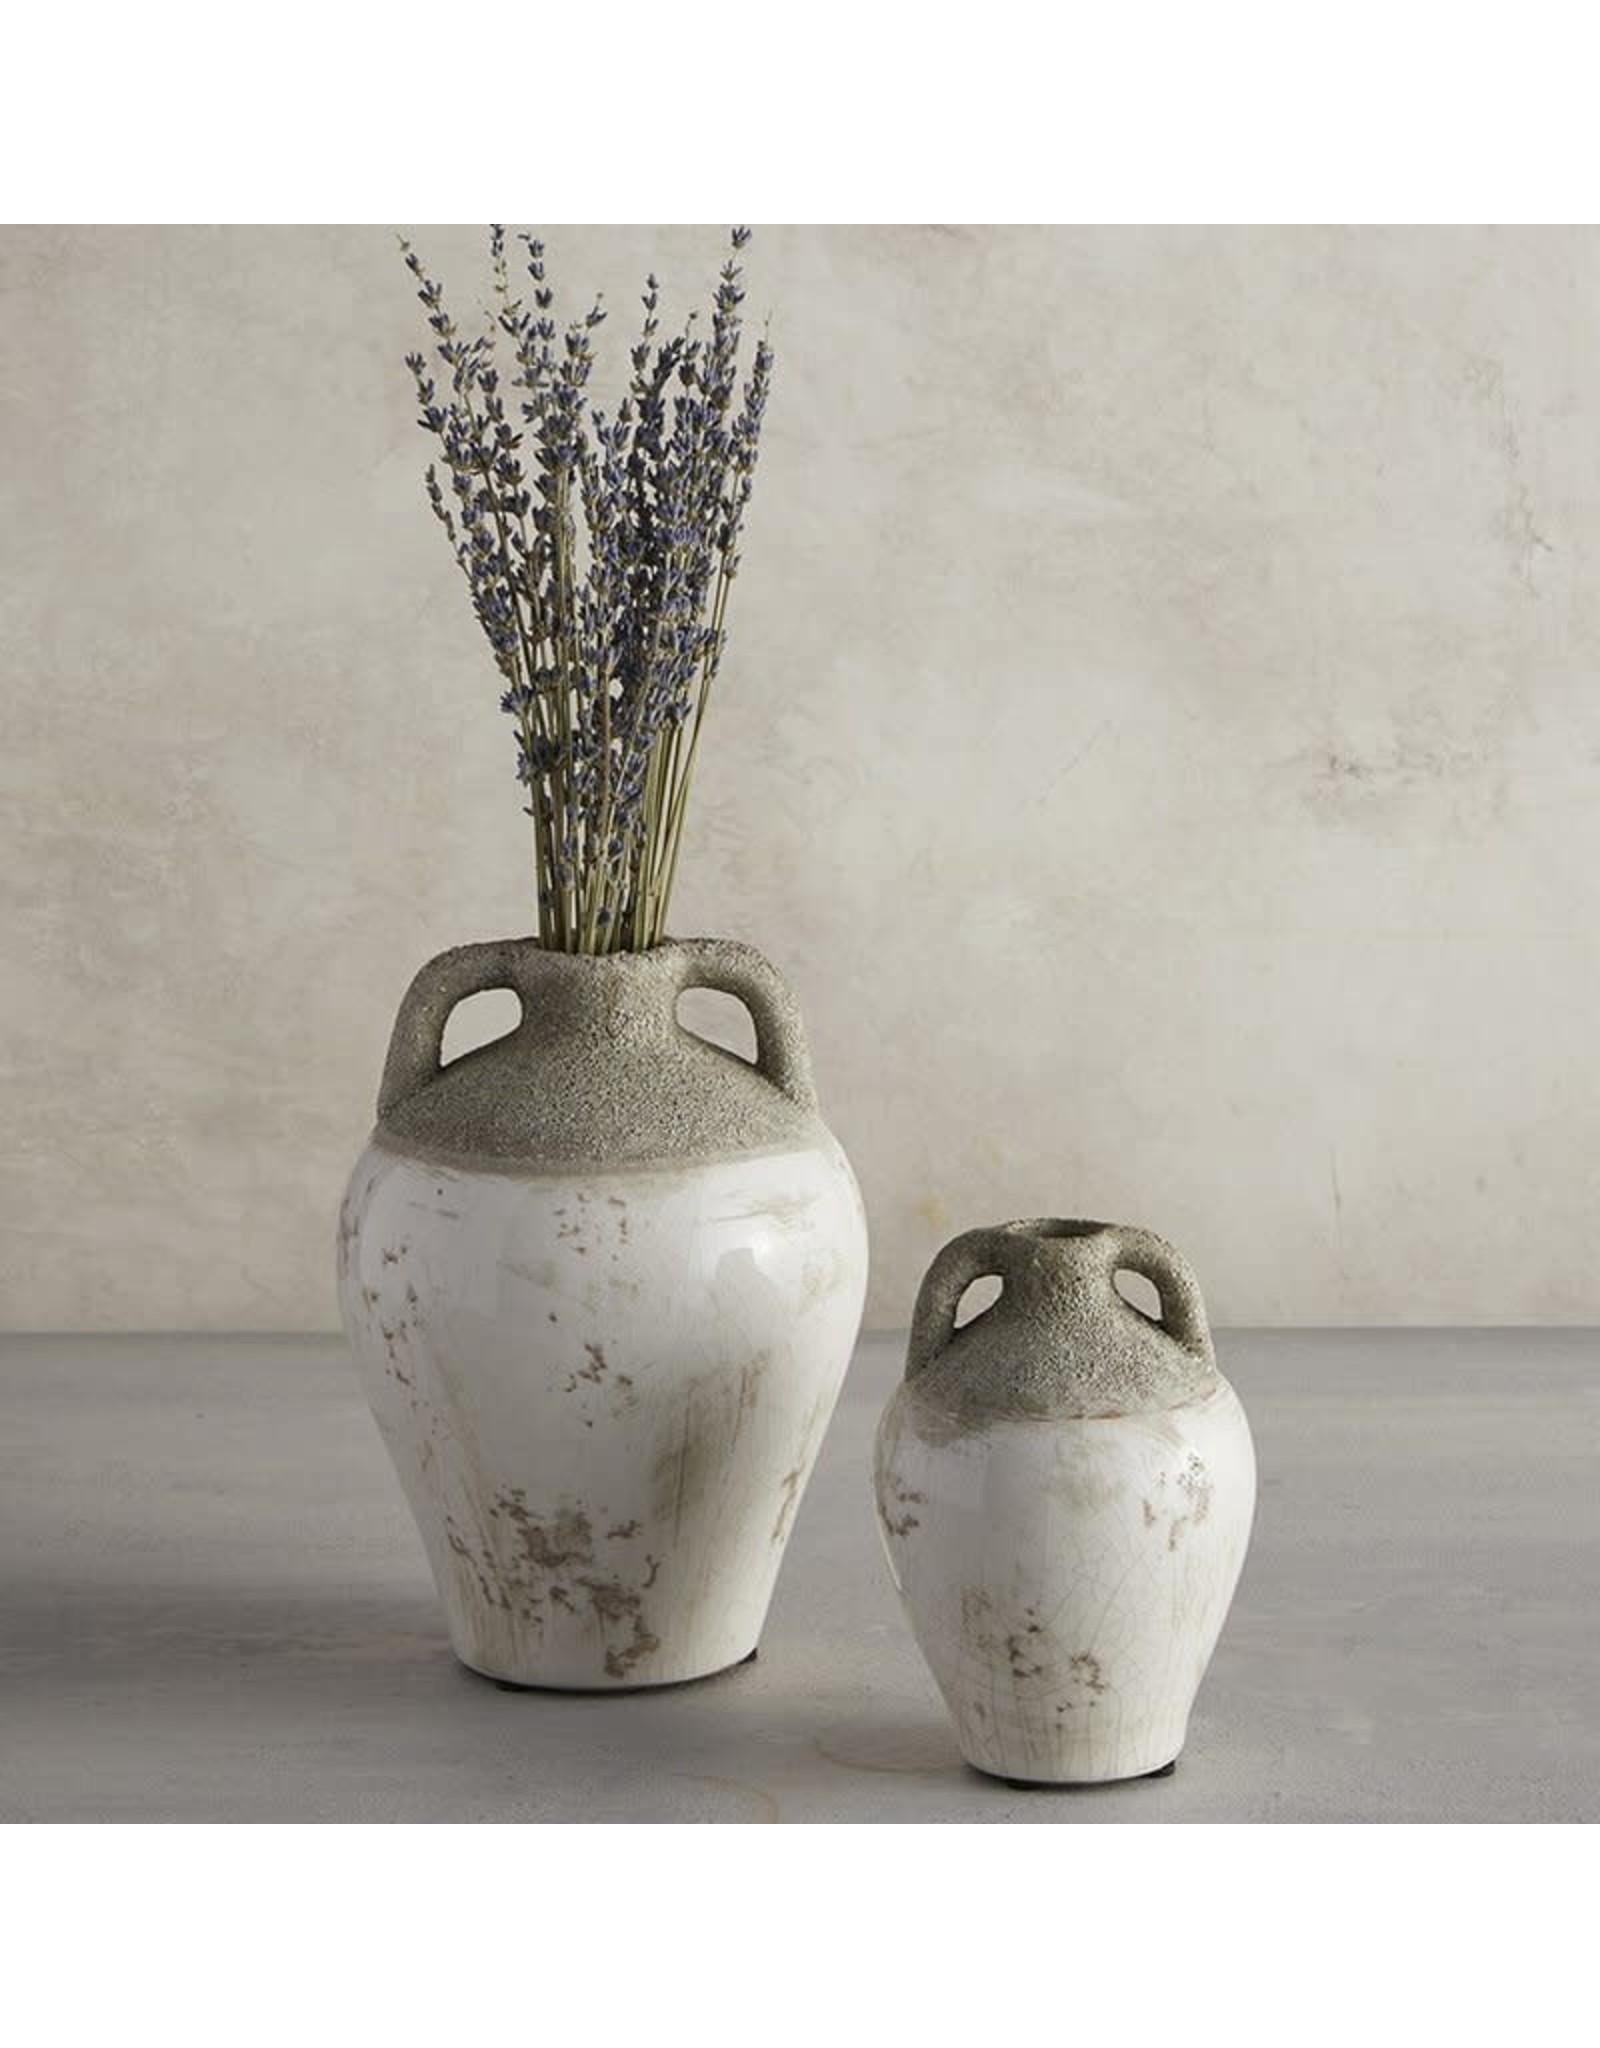 Creative Brands Amphora Large Vase